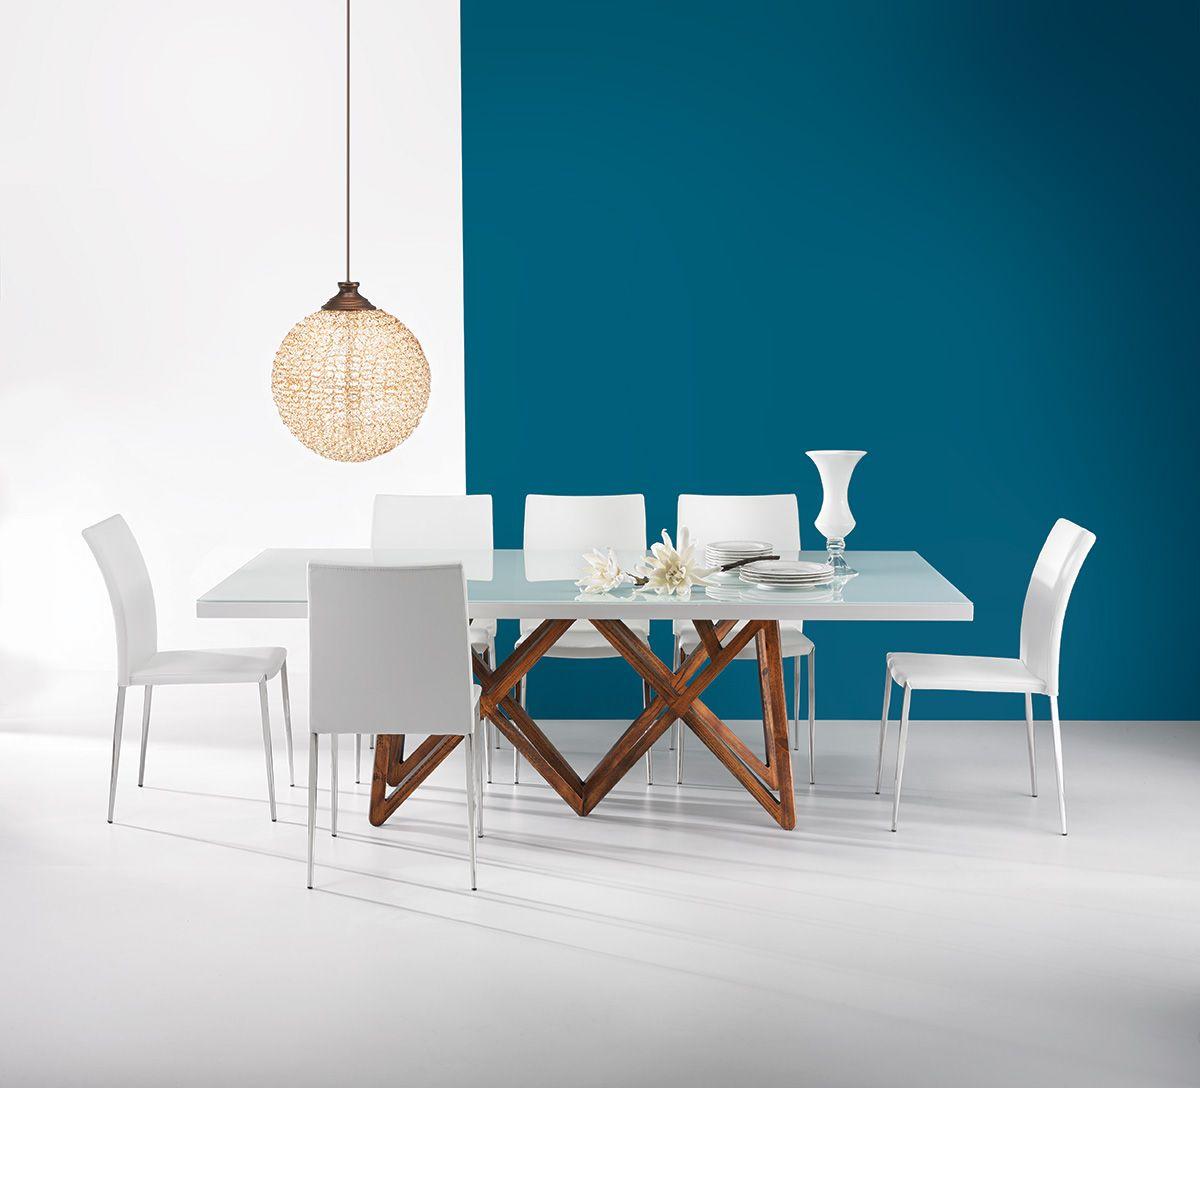 The Dump Furniture   86 WHITE PLAINS TABLE. The Dump Furniture   86 WHITE PLAINS TABLE           Pinterest